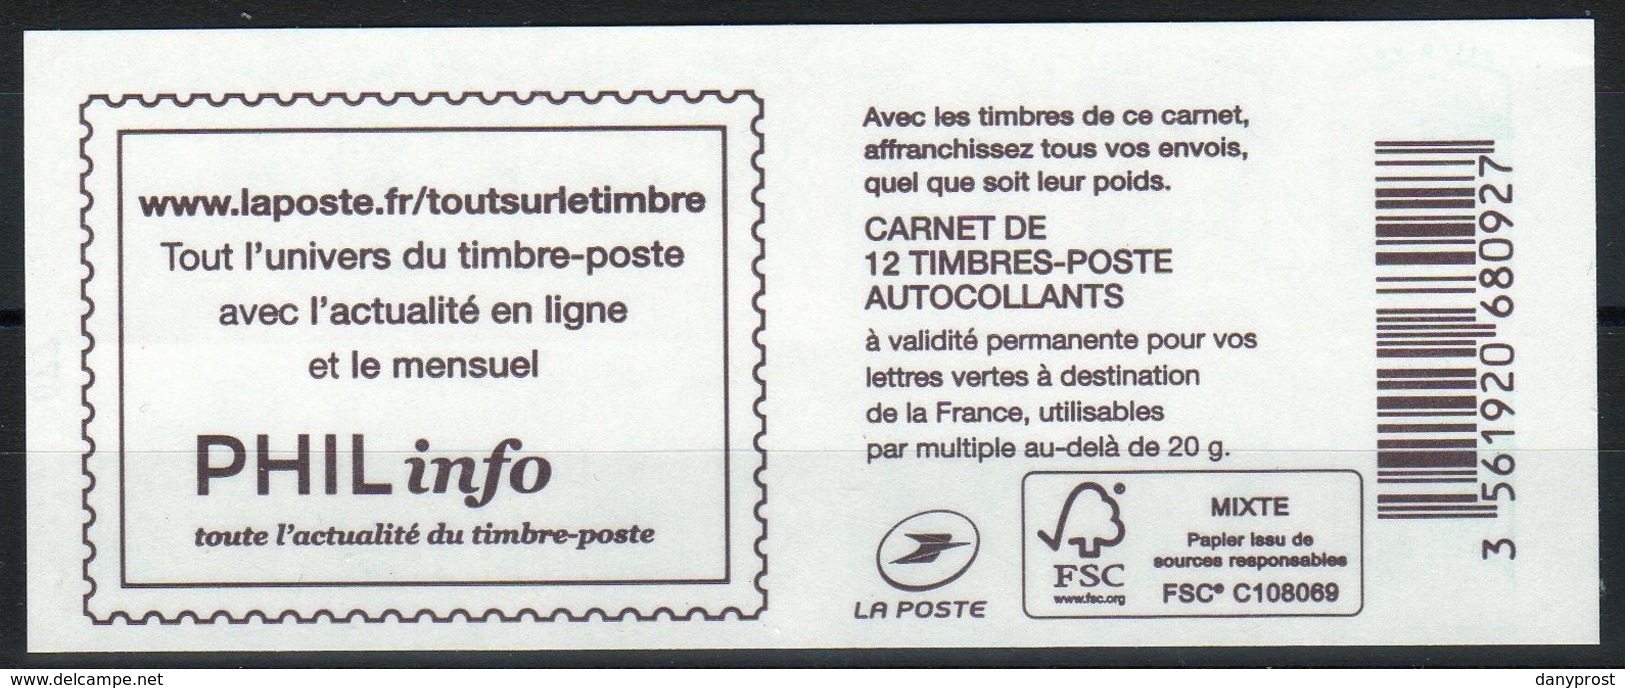 "CARNET 1215-C.. / 12 MARIANNE CIAPPA TVP VERT SANS GRAMMAGE / COUVERTURE "" PHILinfo "" NEUF - Carnets"